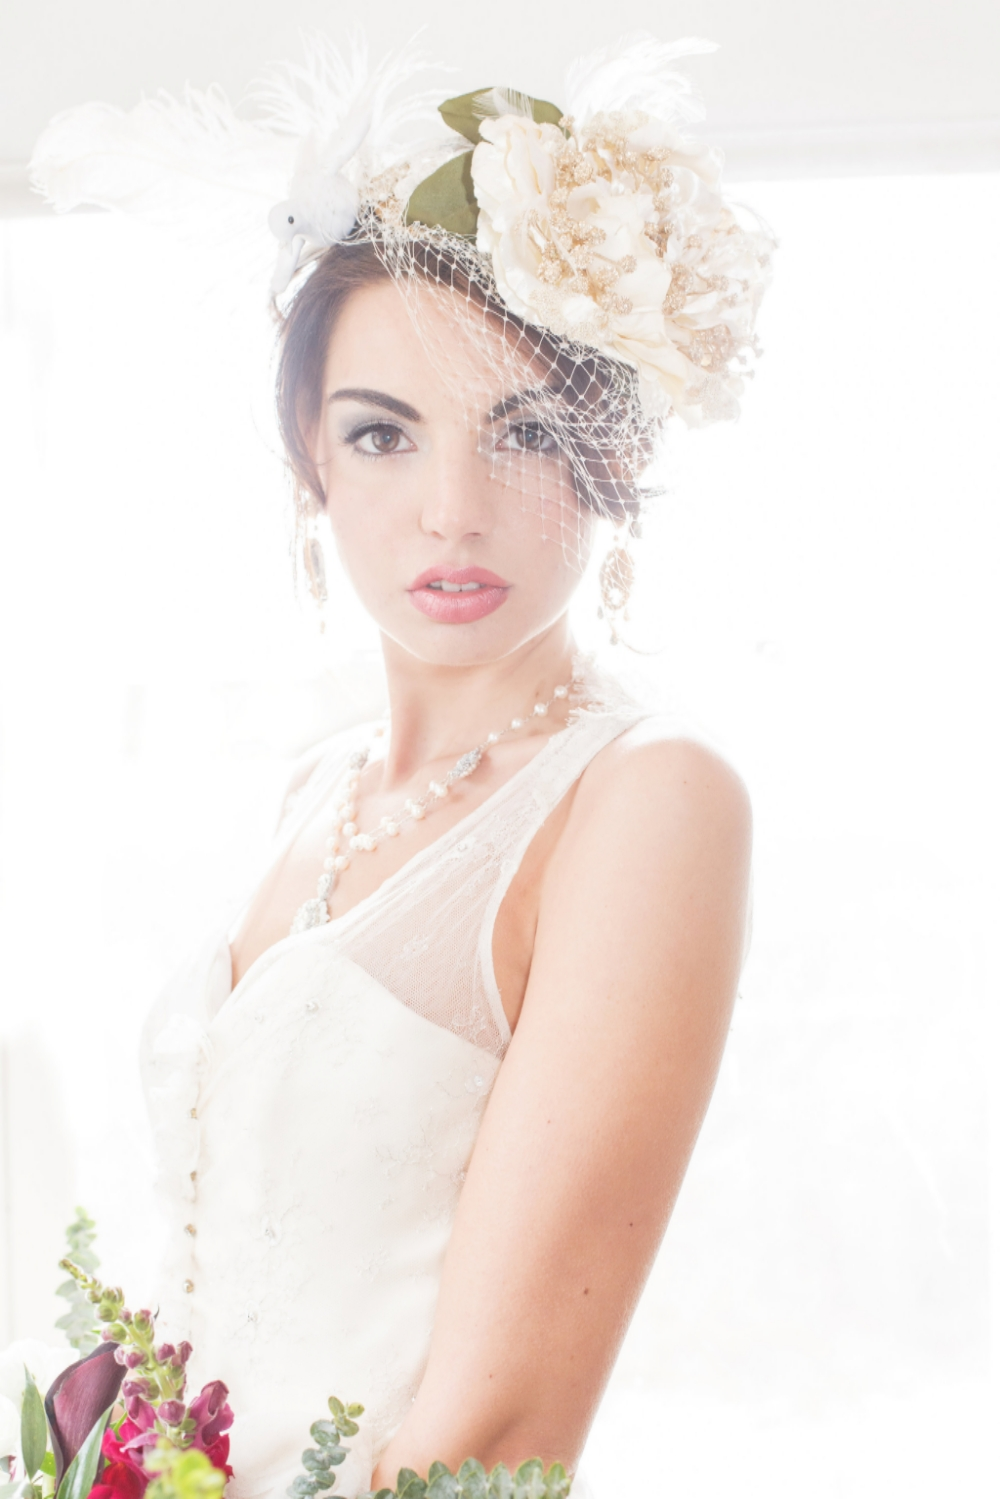 Edera Jewelry Blog | Vintage-Inspired Pearl Wedding Jewelry